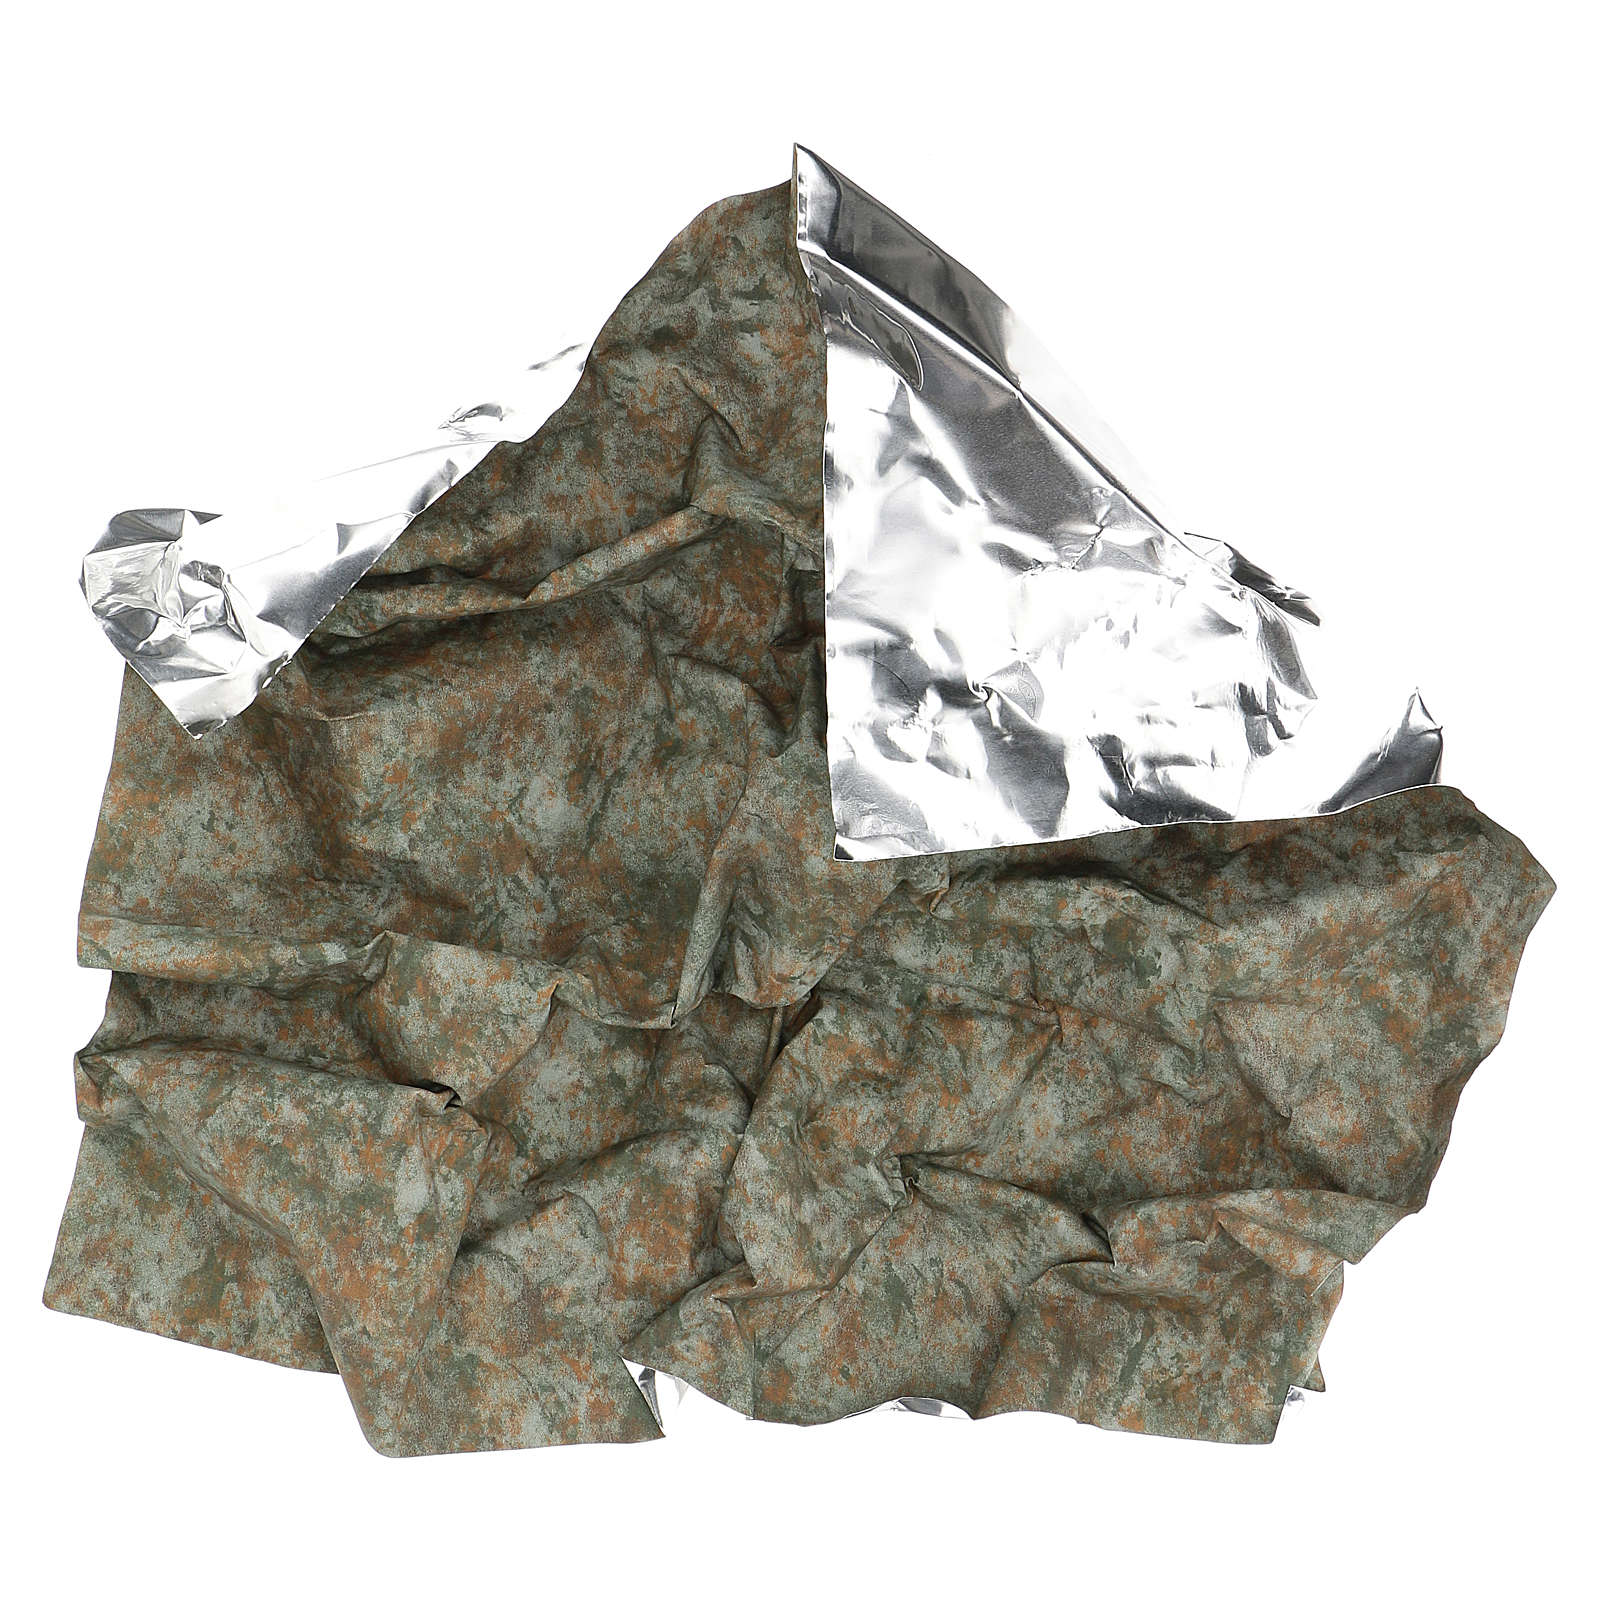 Carta corteccia plasmabile 60x60 cm per presepi 4